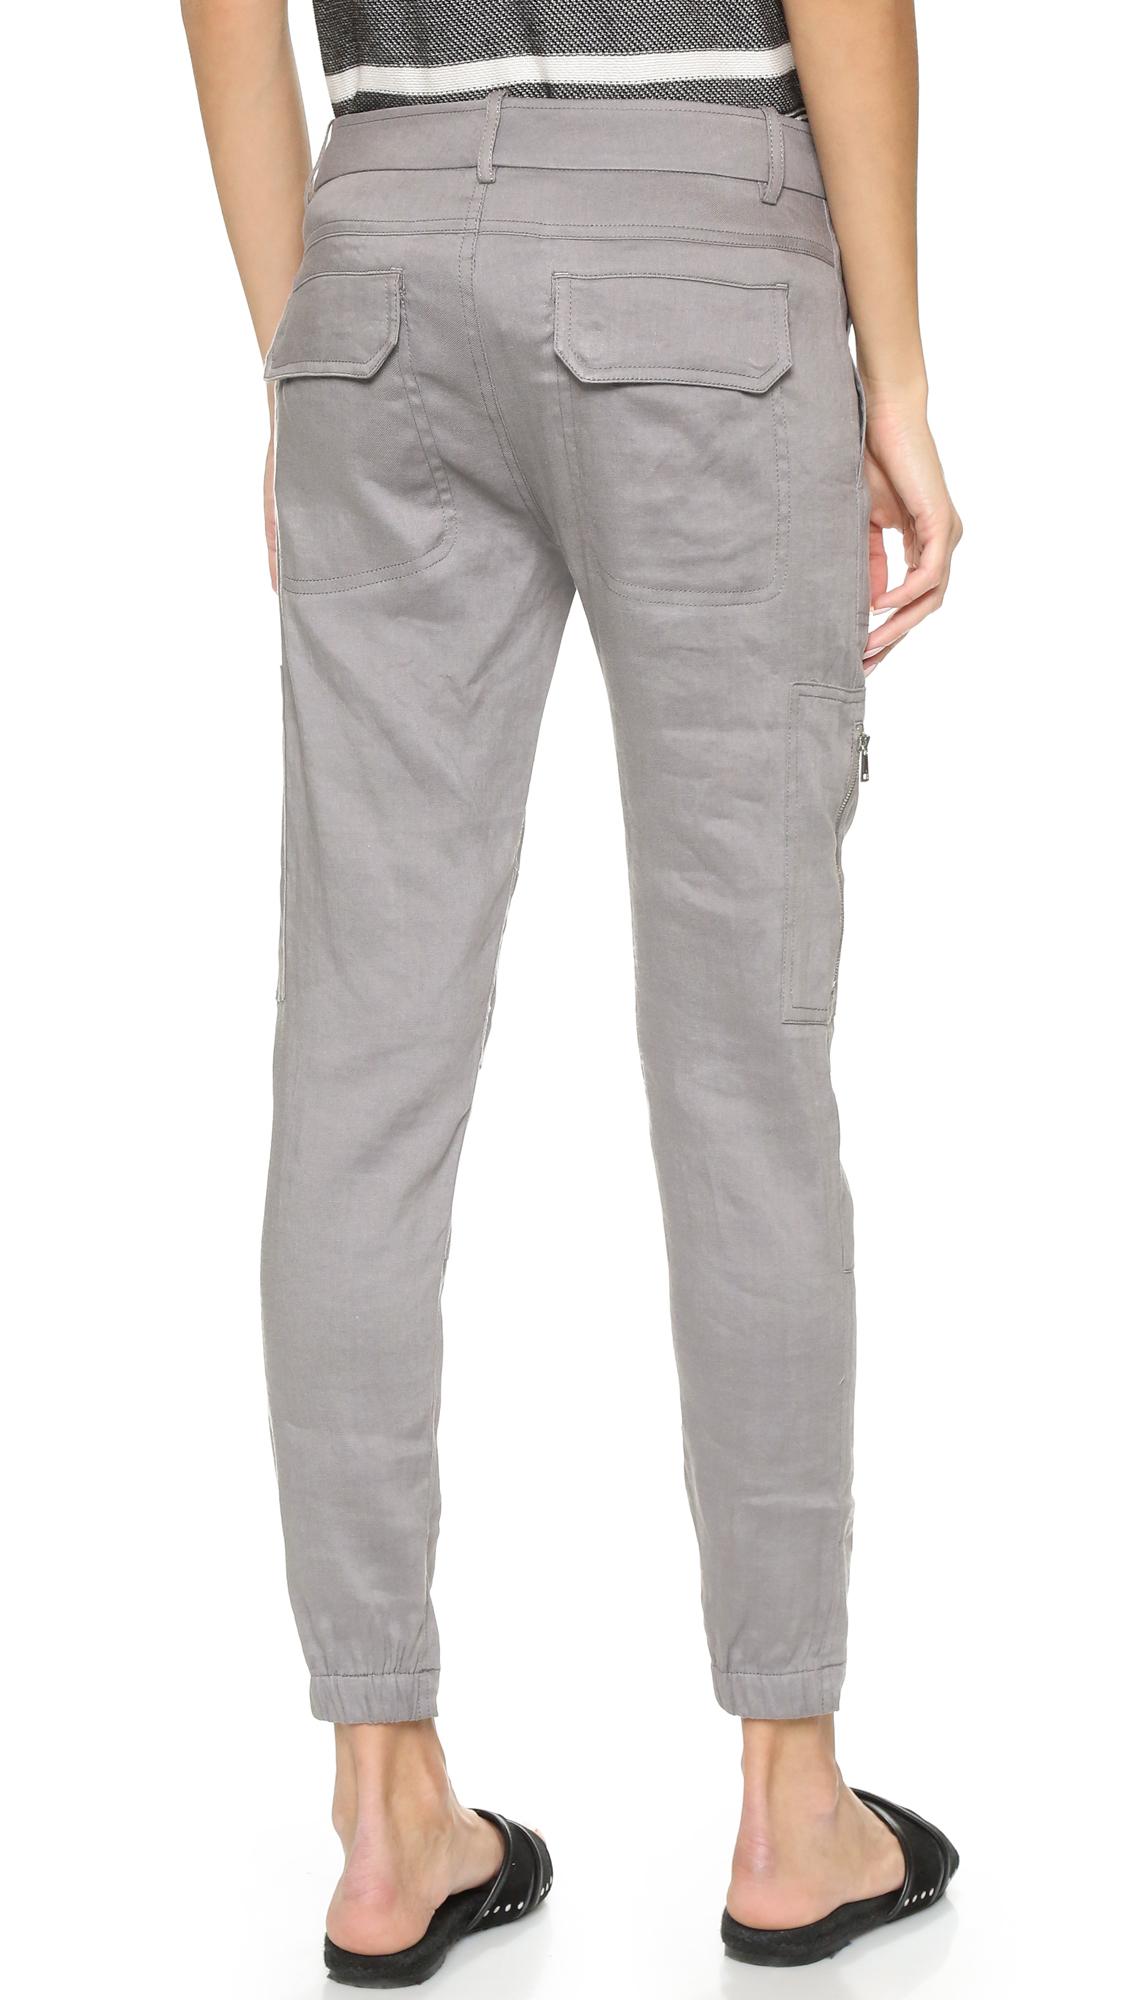 e9fd4651a2 Lyst - Vince Linen Cargo Pants